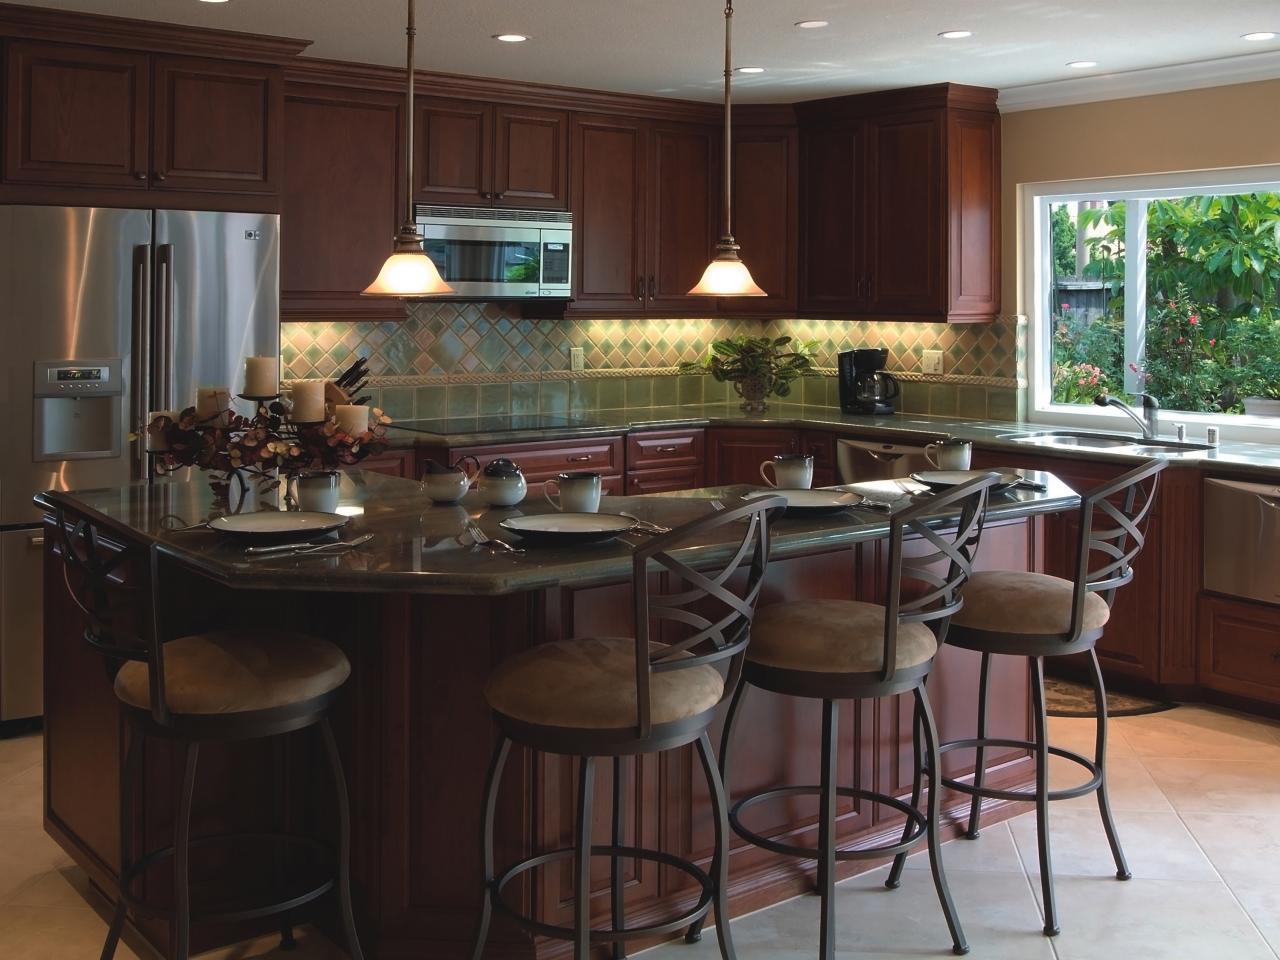 Design layout of kitchen - Small Kitchen Island